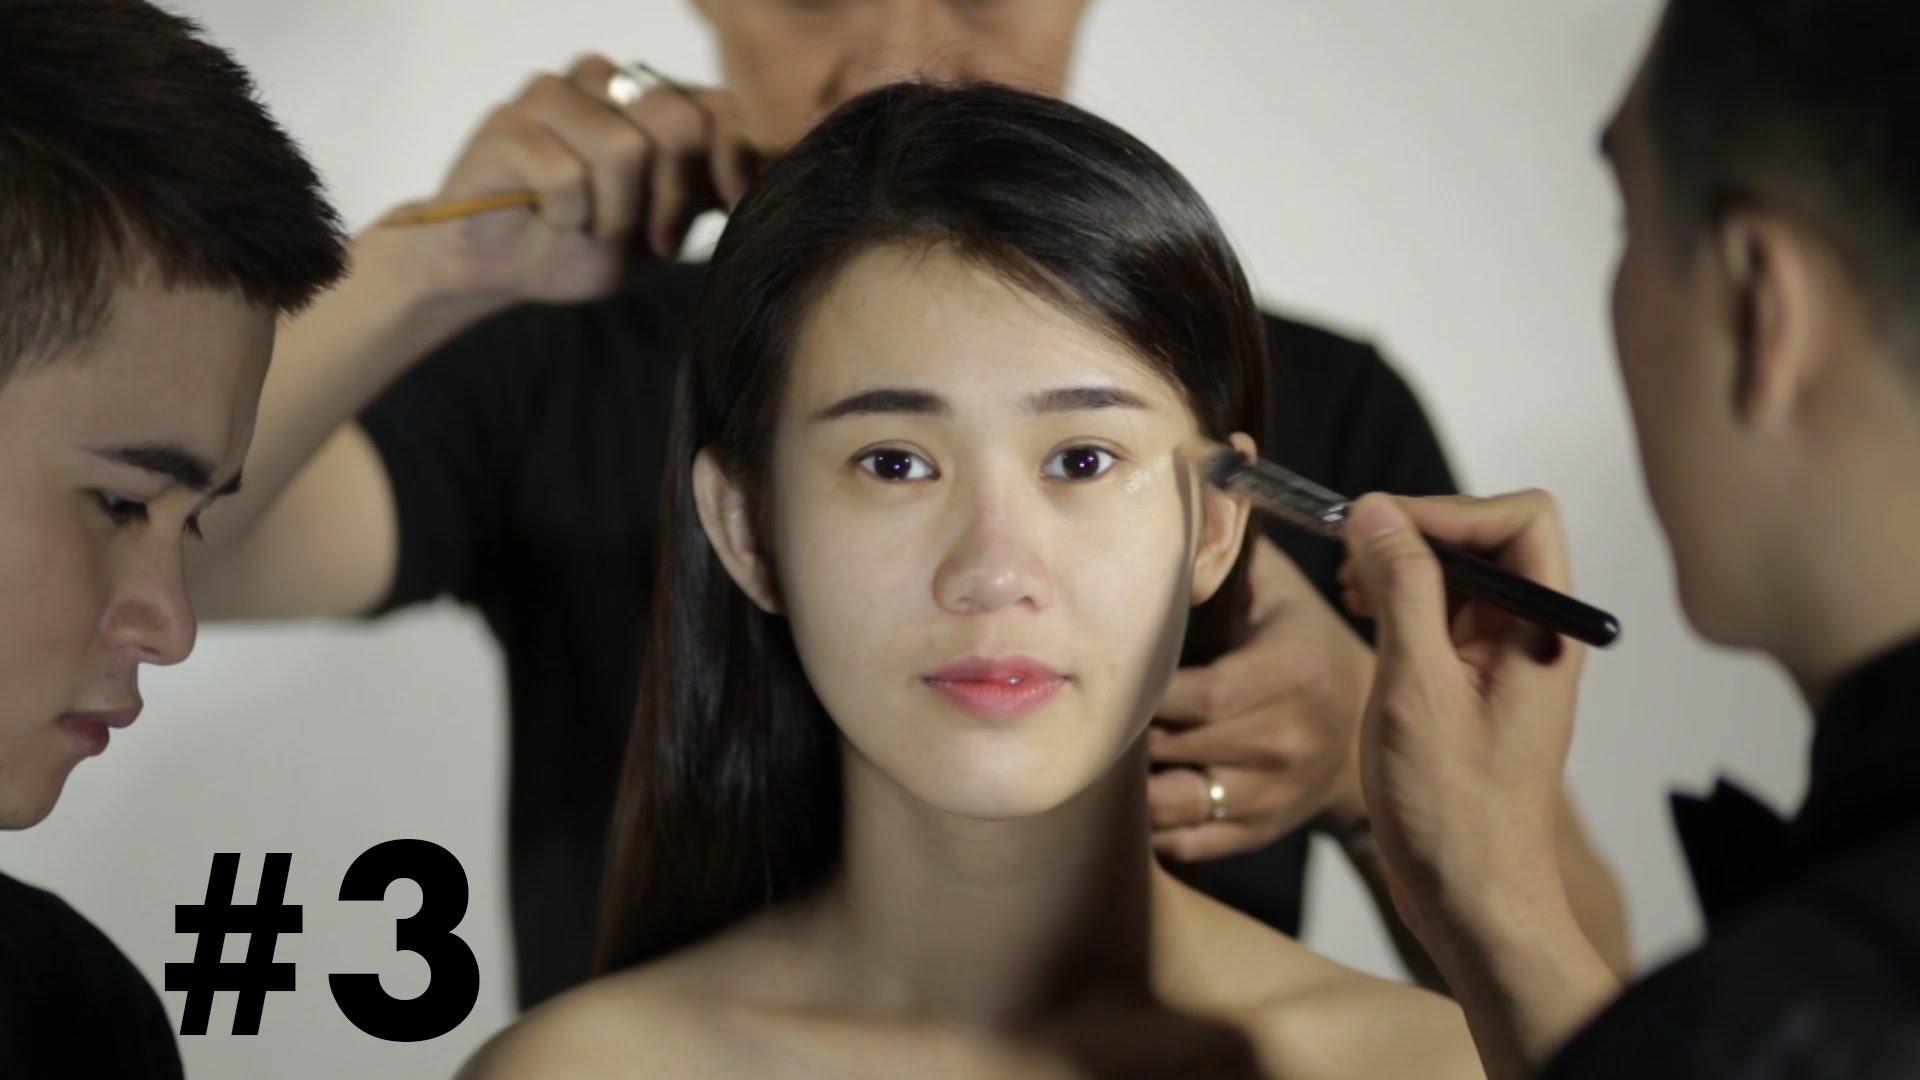 100 năm vẻ đẹp phụ nữ Việt (Makeup) – Vietnam Beauty Journey